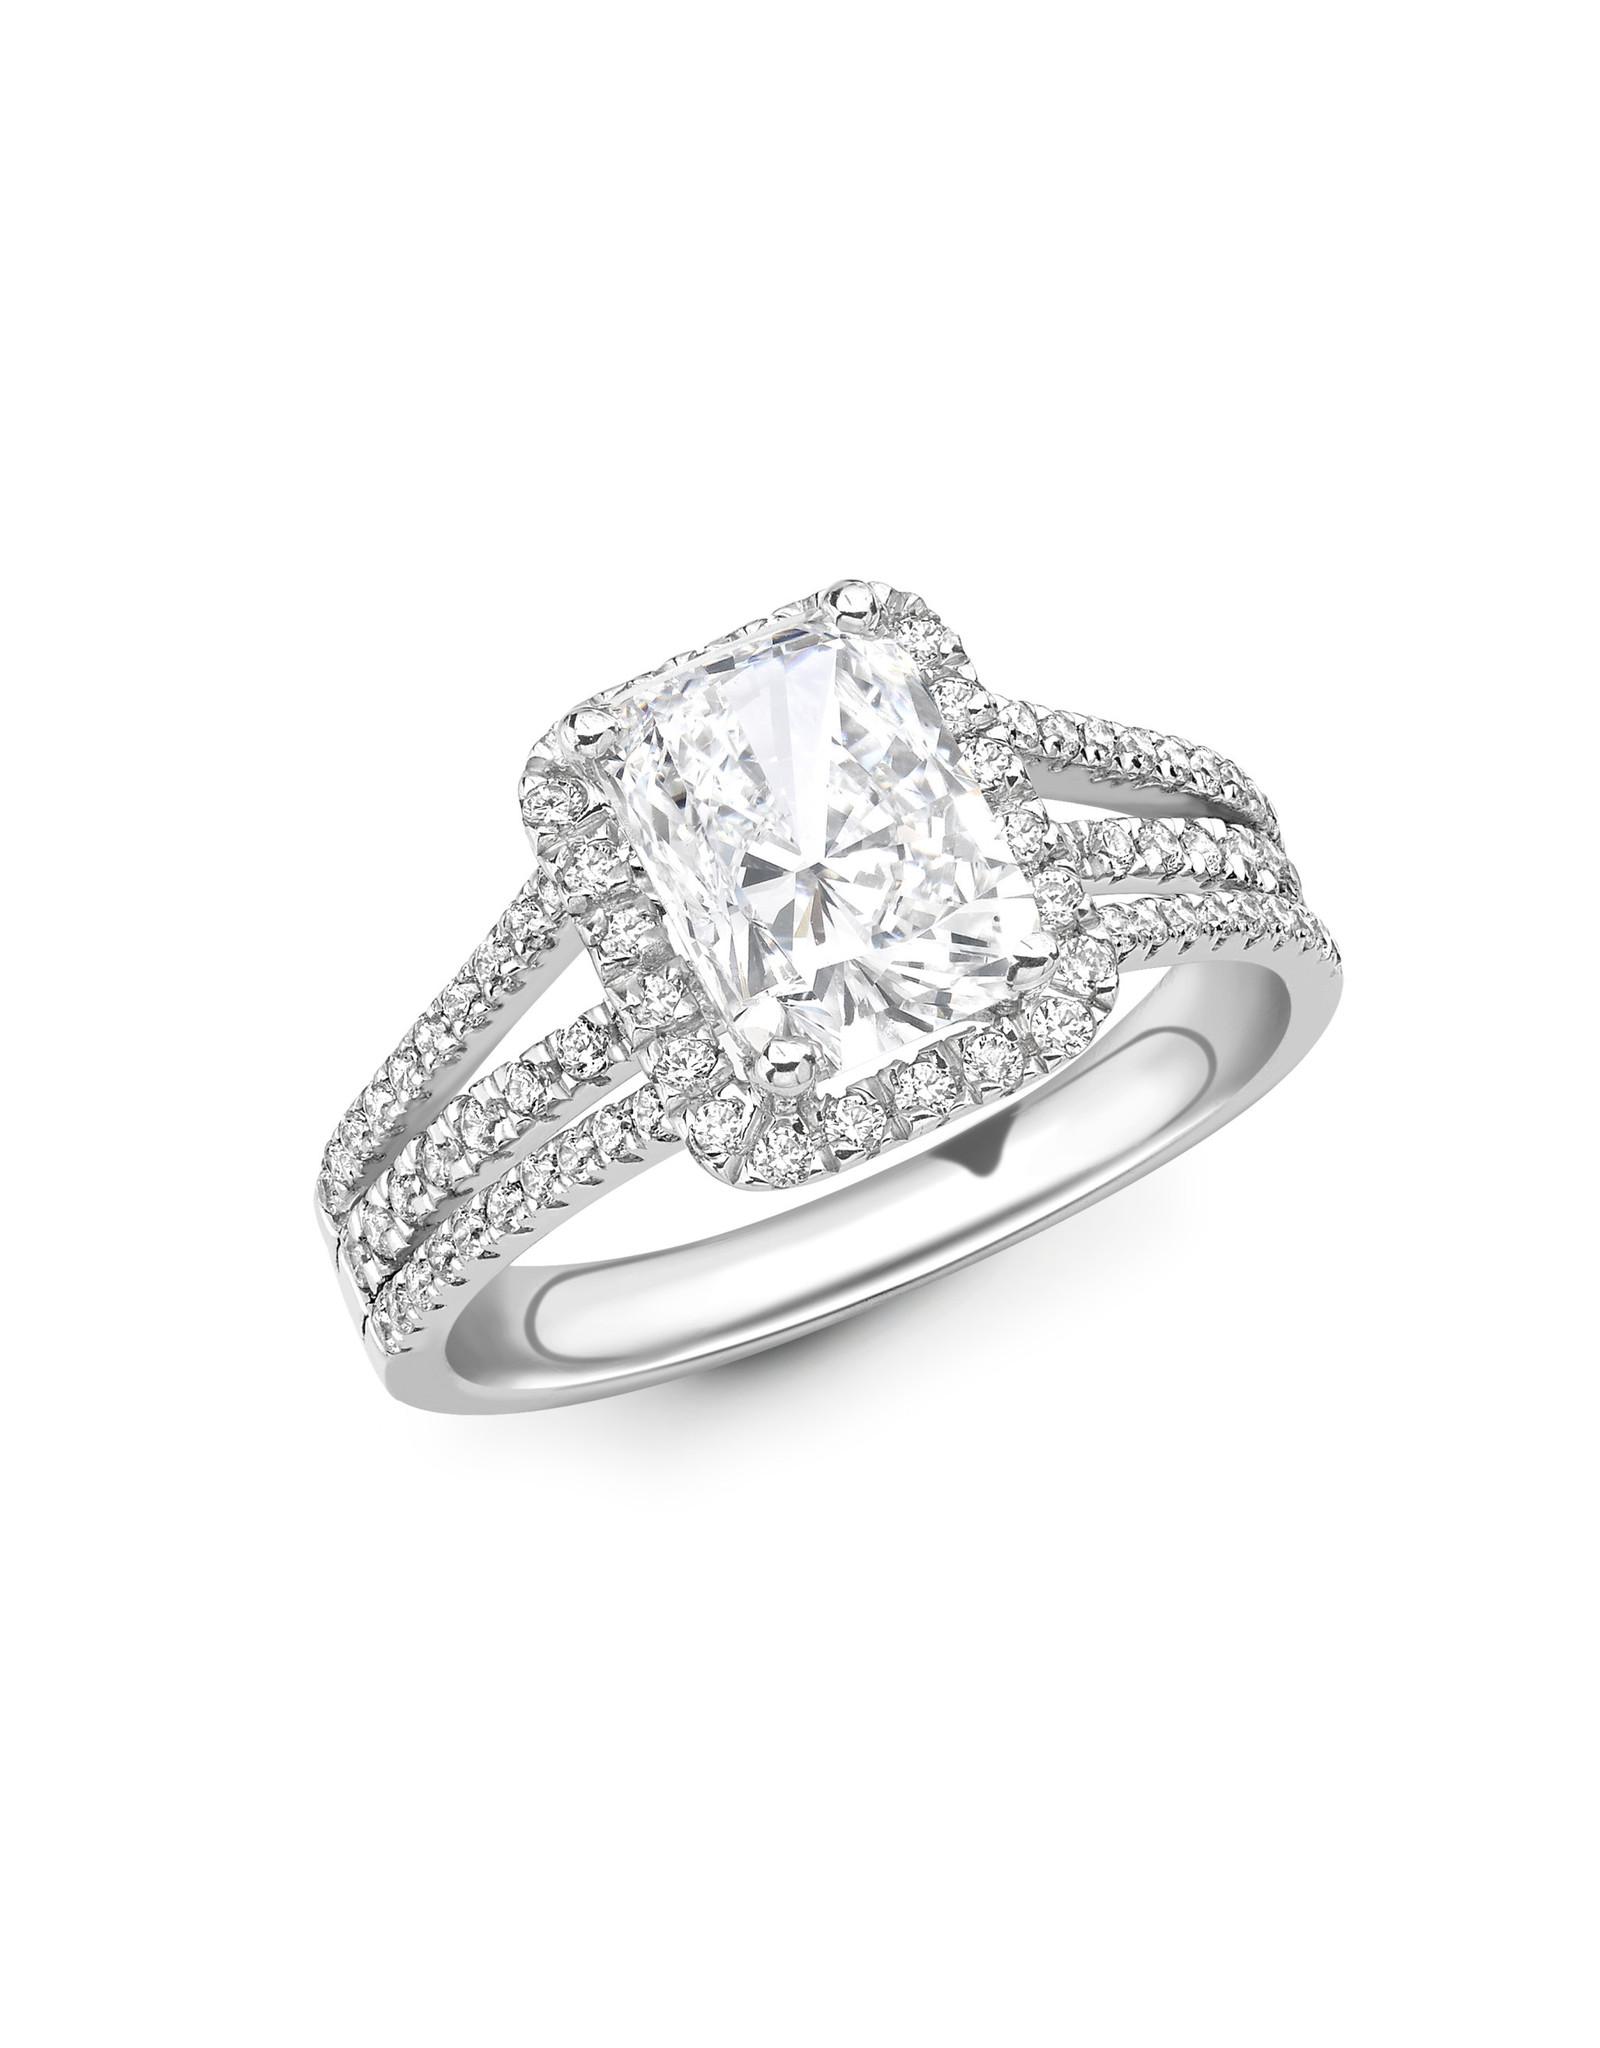 LVN Emerald Cut Exclusive Verlovingsring LVNRX6903